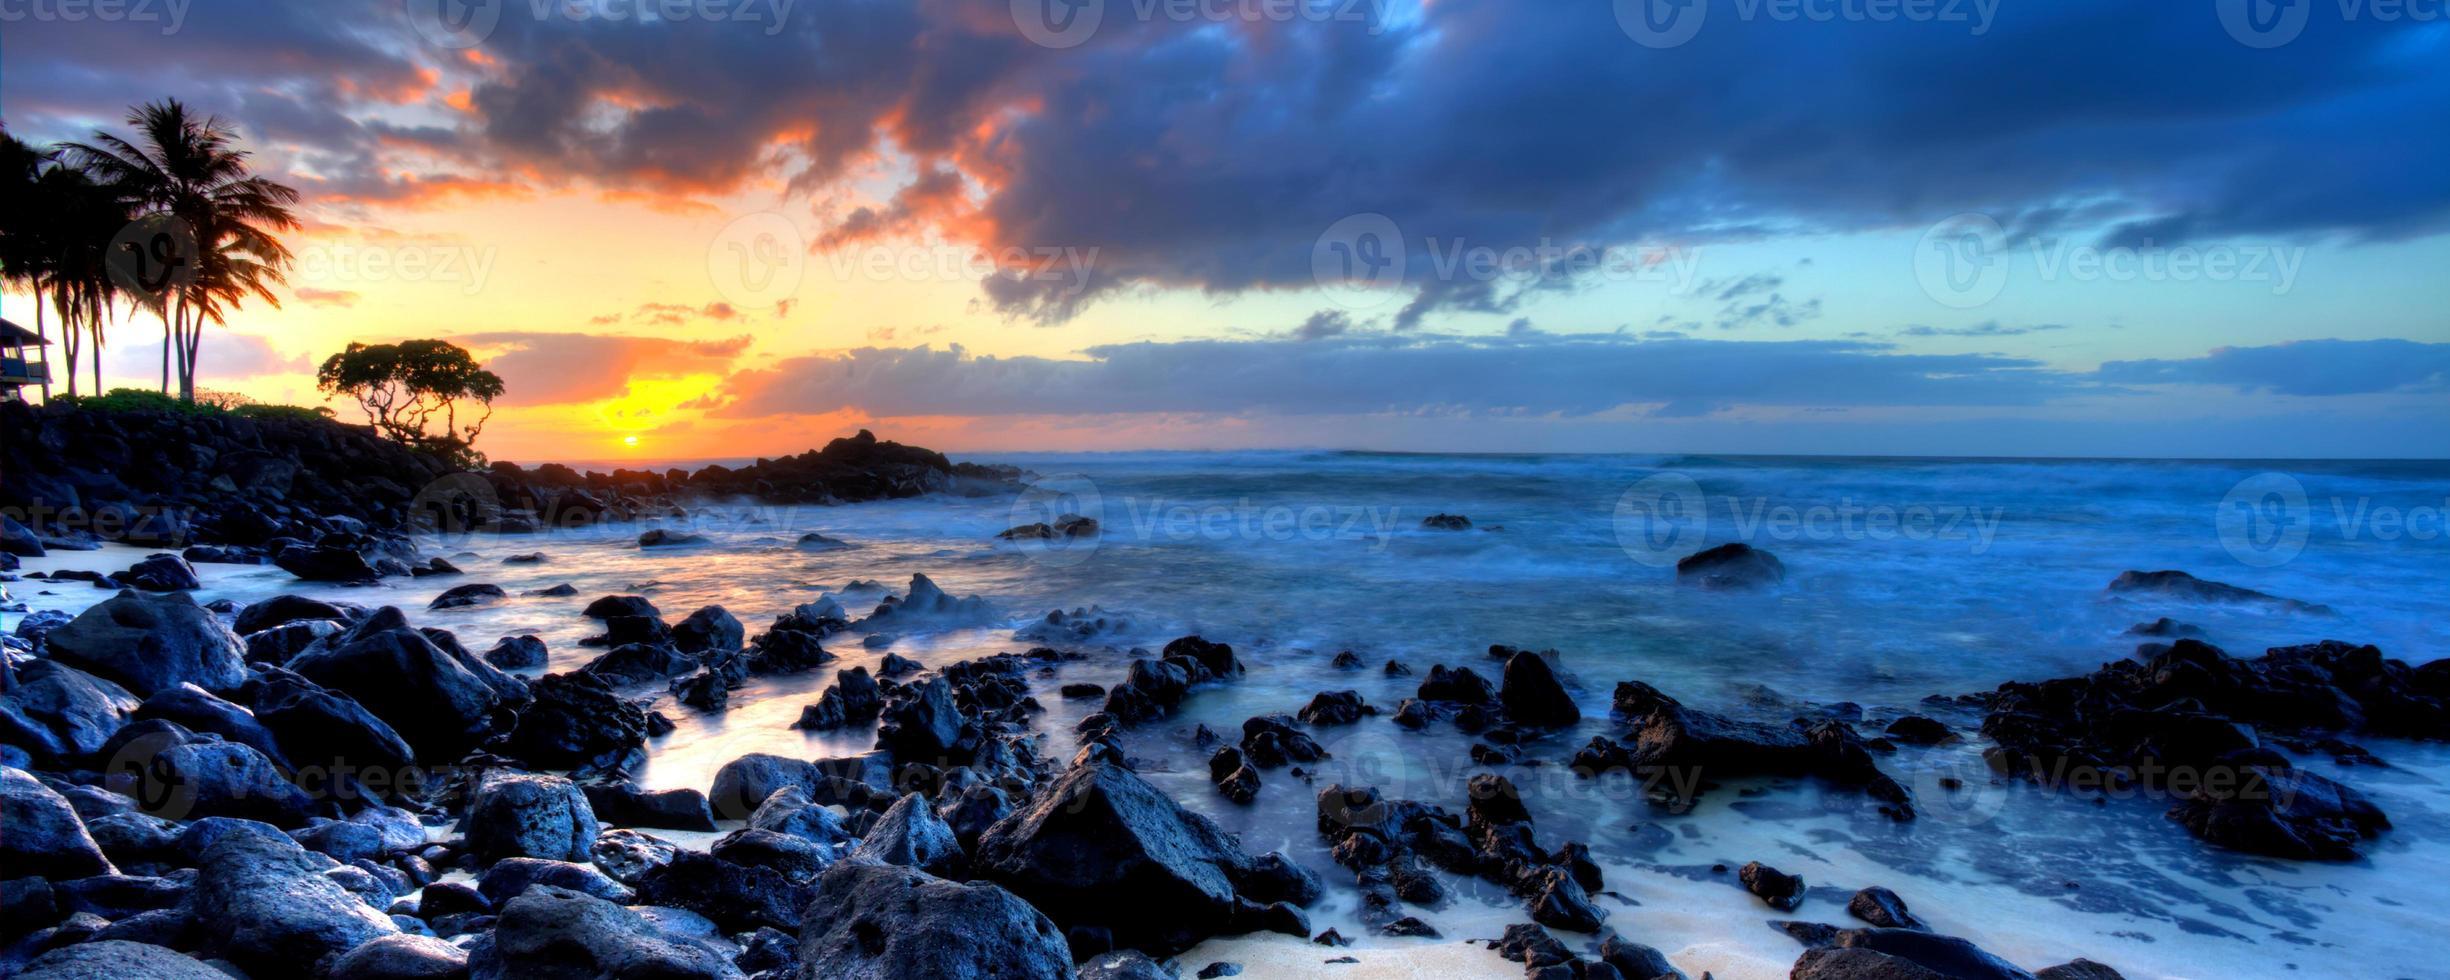 Aloha Nächte foto